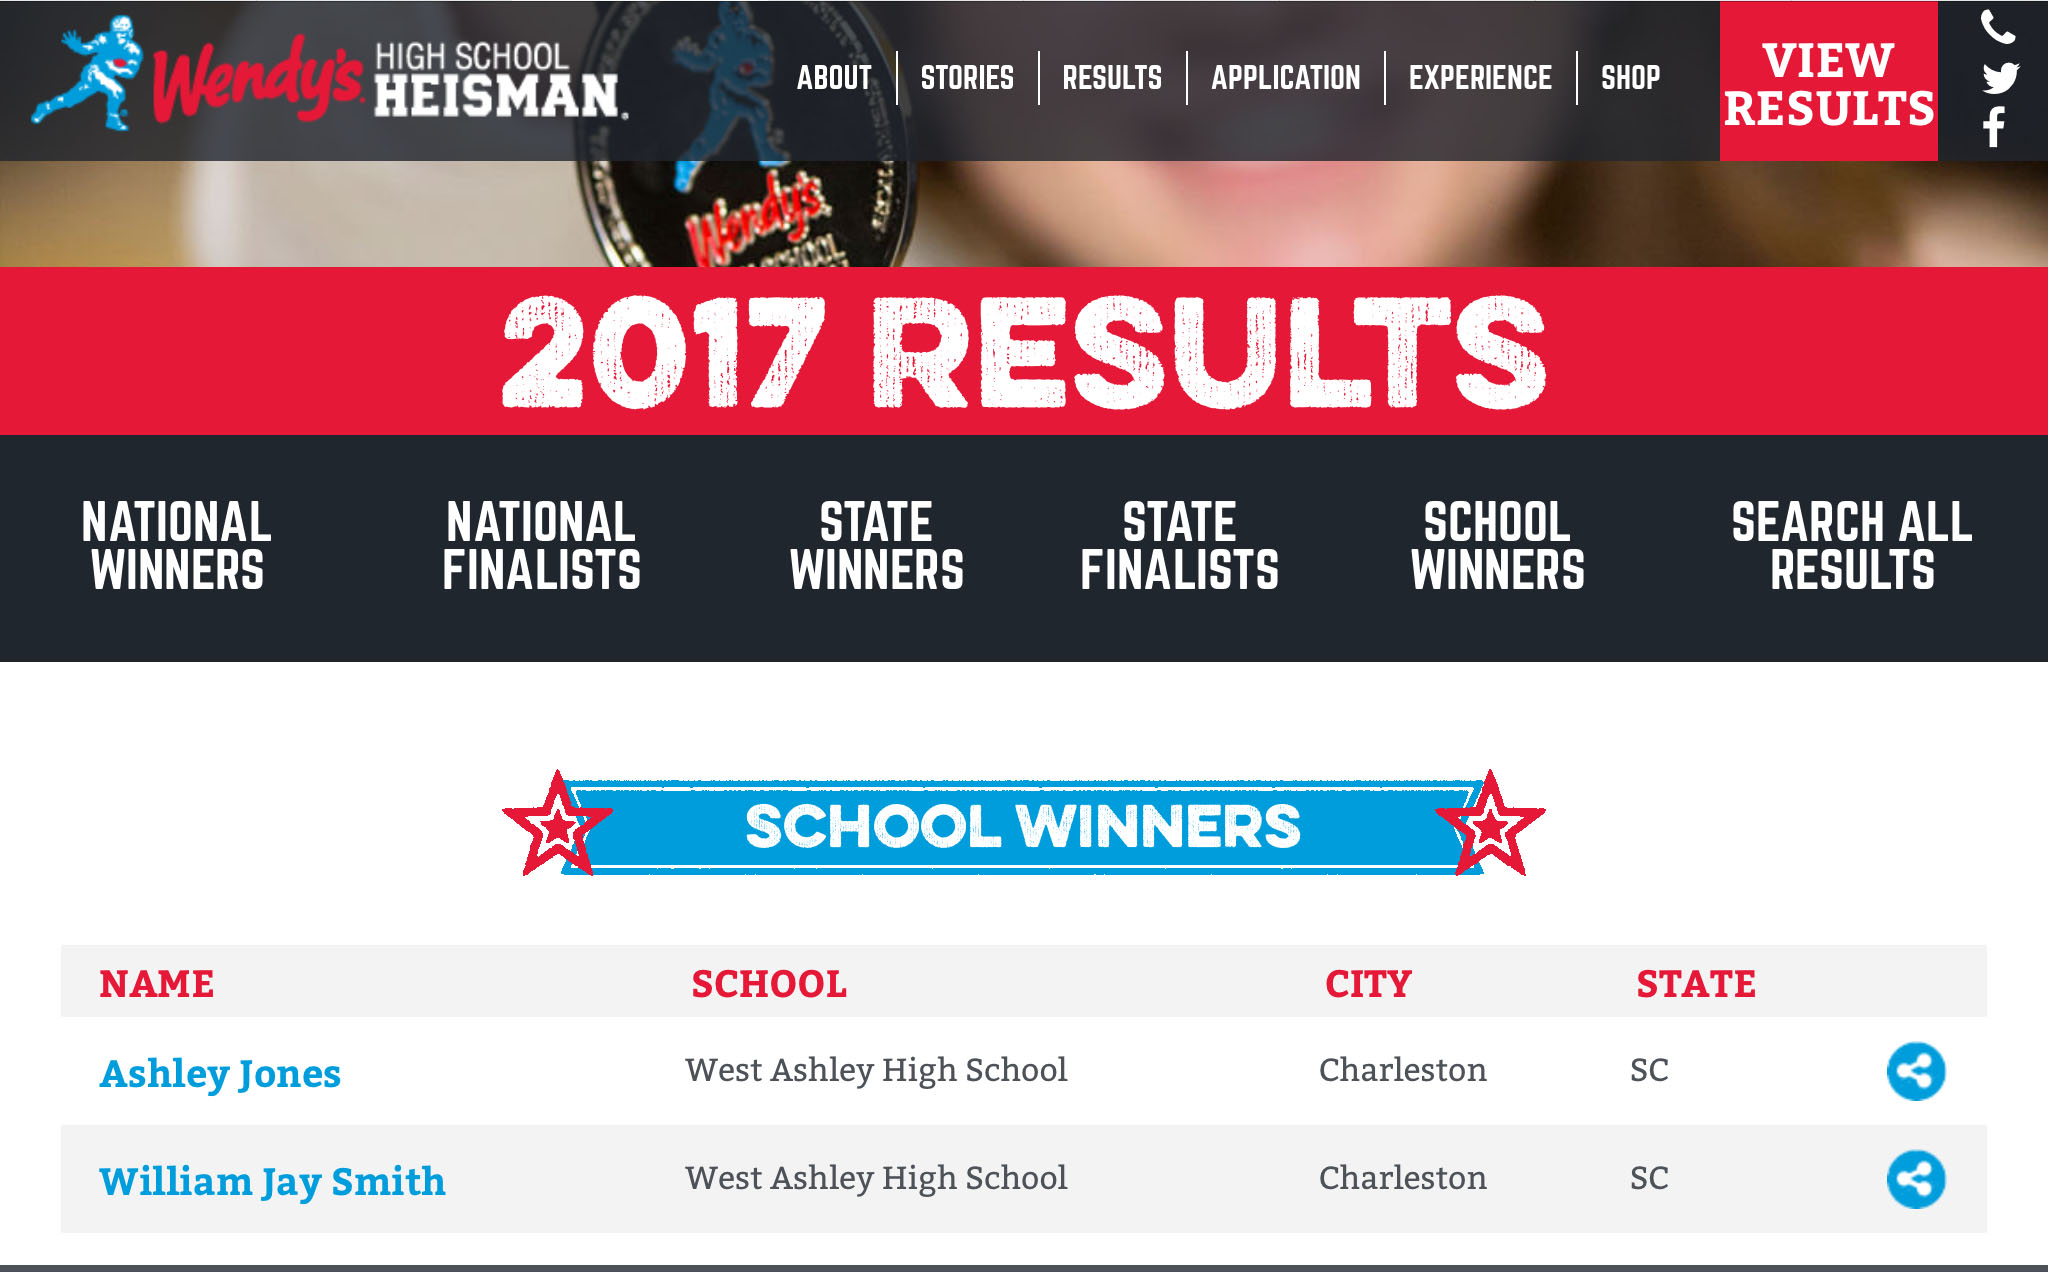 Wendy's High School Heisman School Winners